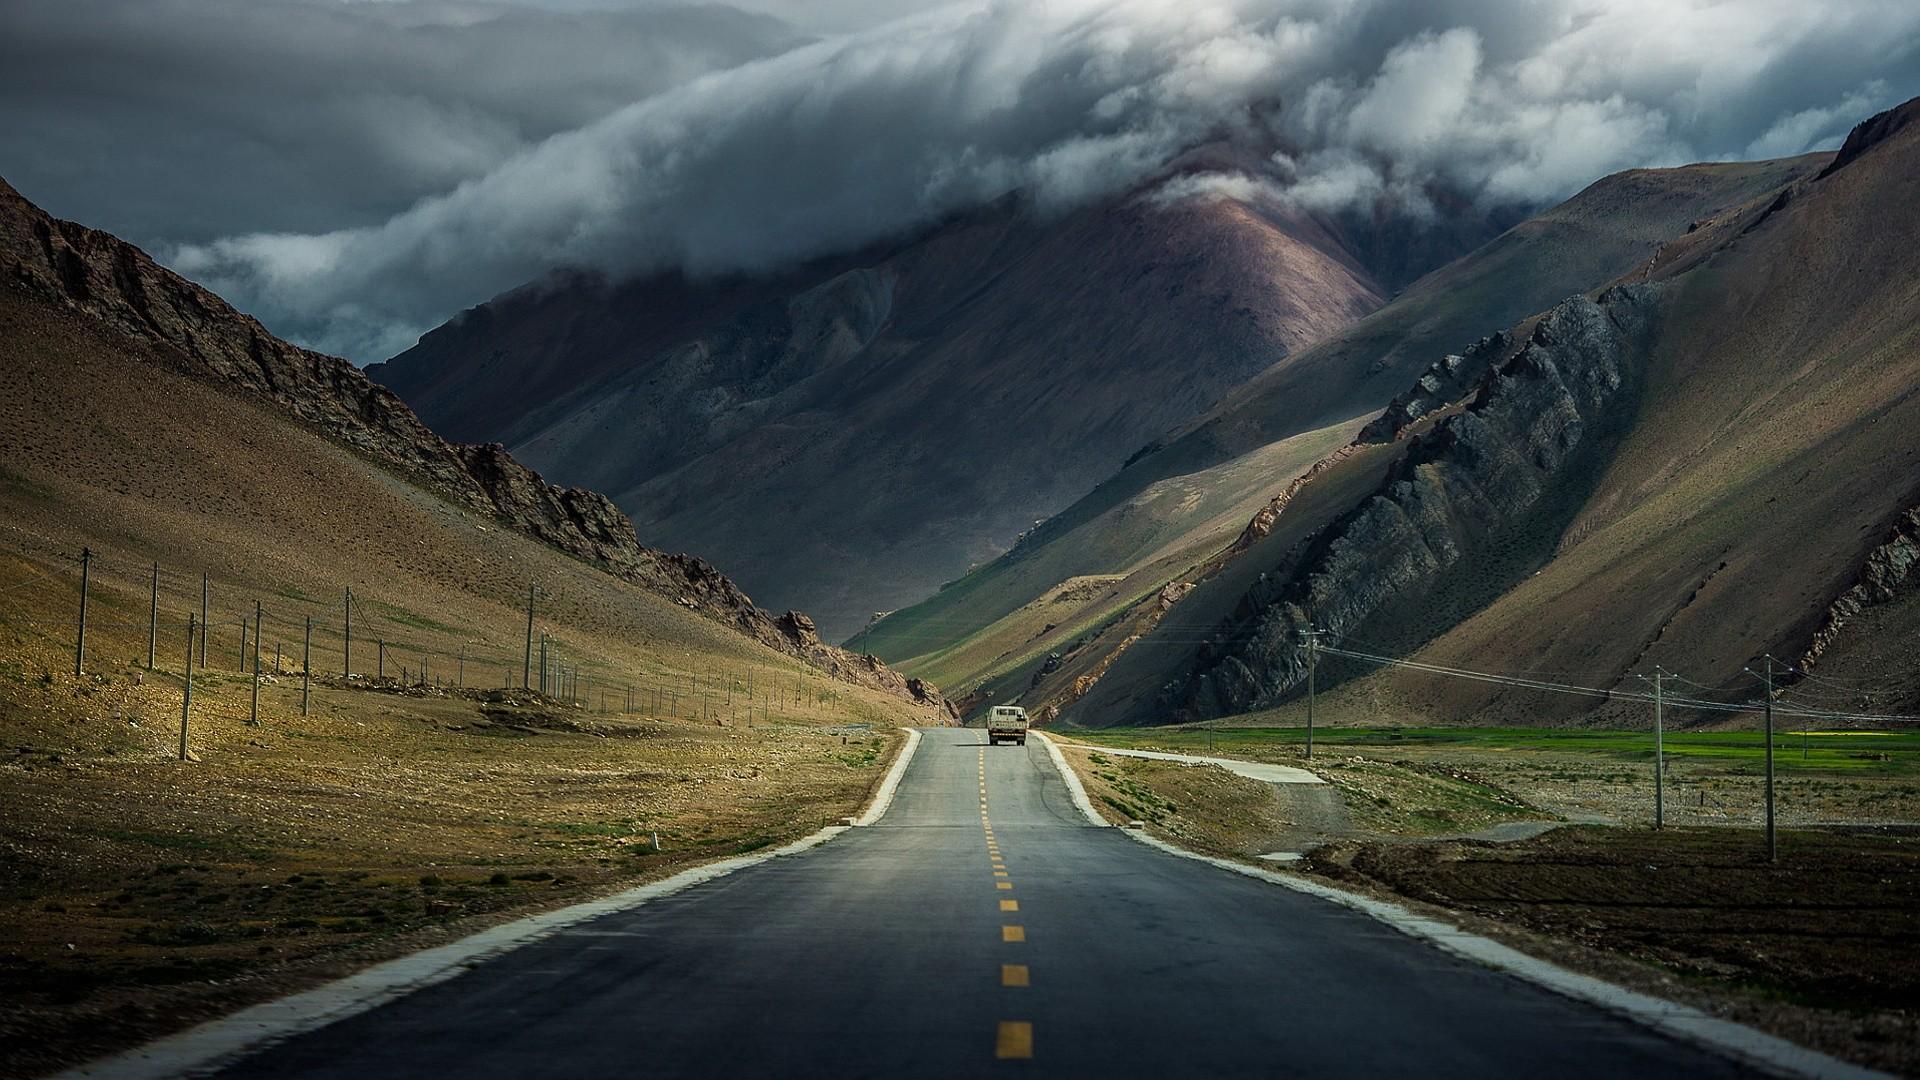 road-mountains-overcast-clouds-1920×1080.jpg (1920×1080) · Hd  WallpaperWallpapersThe …